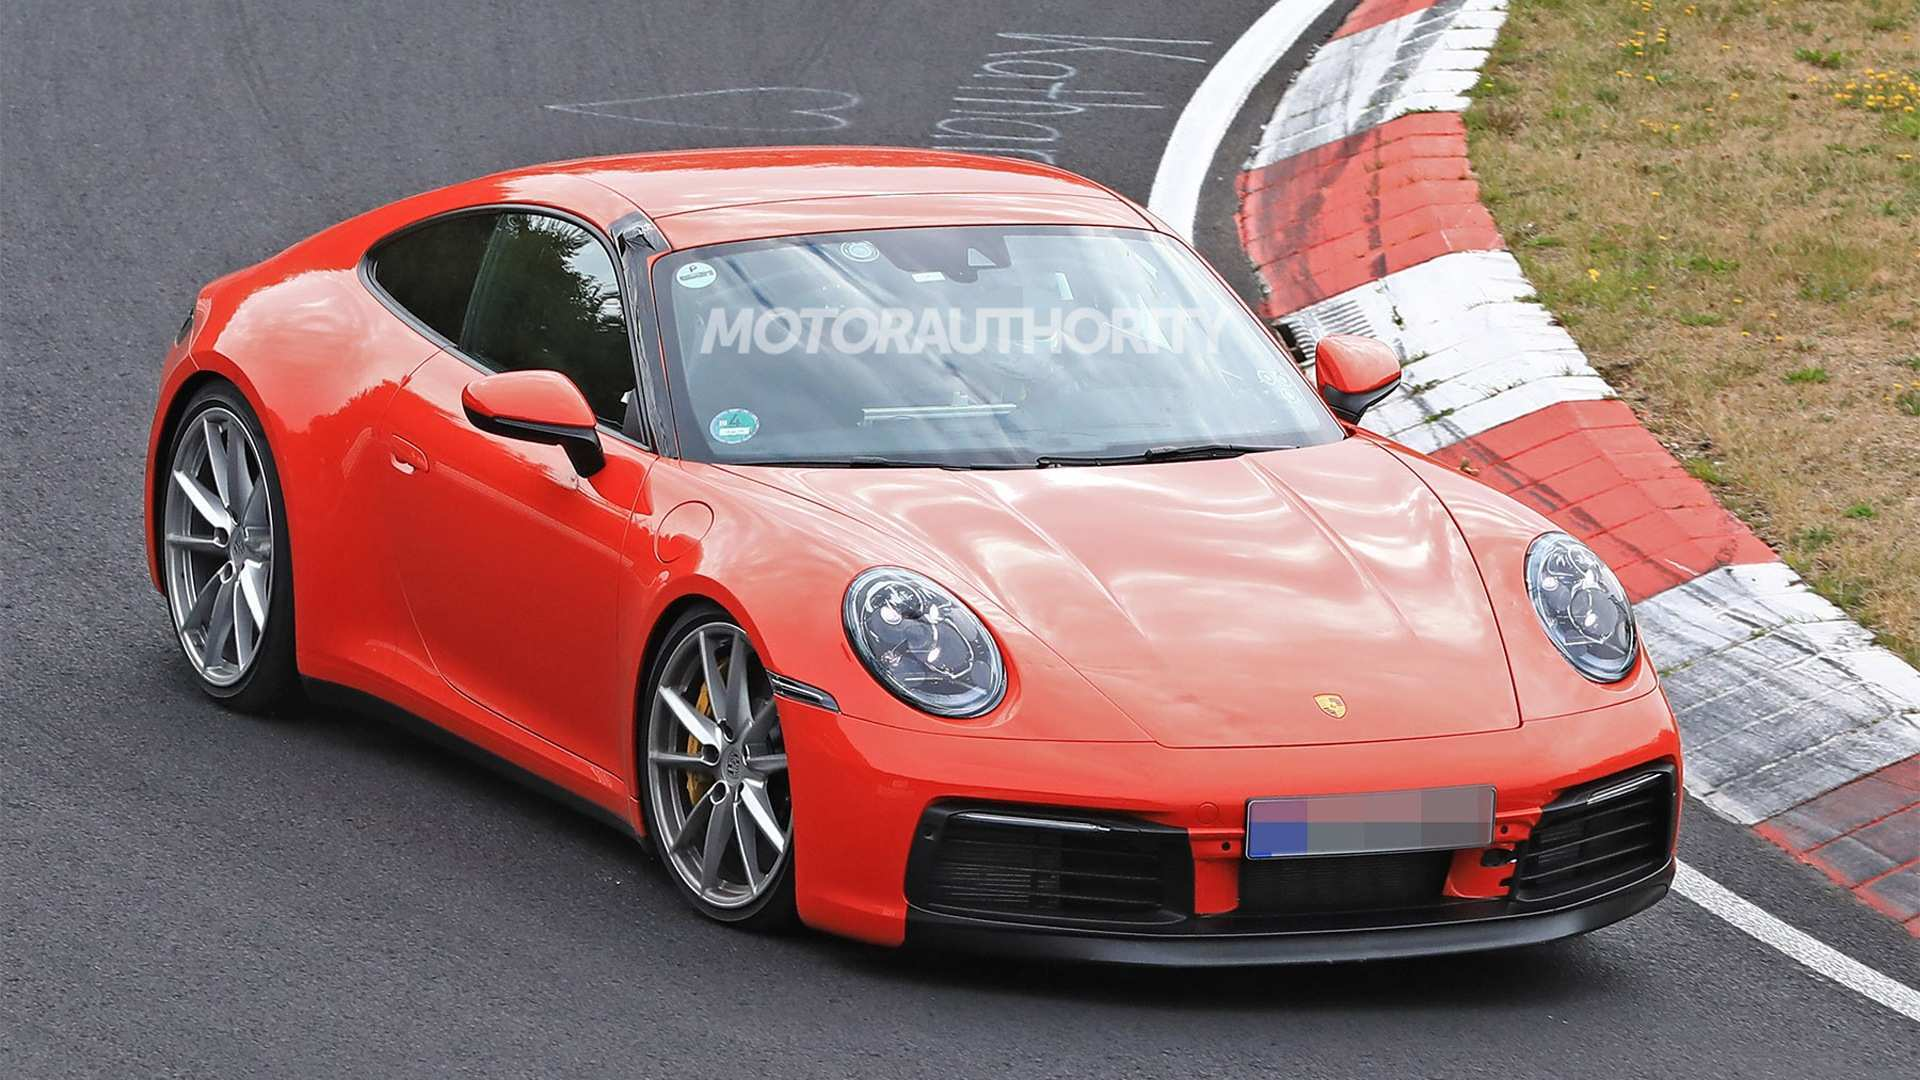 64 Gallery of Porsche Modelle 2020 Prices with Porsche Modelle 2020